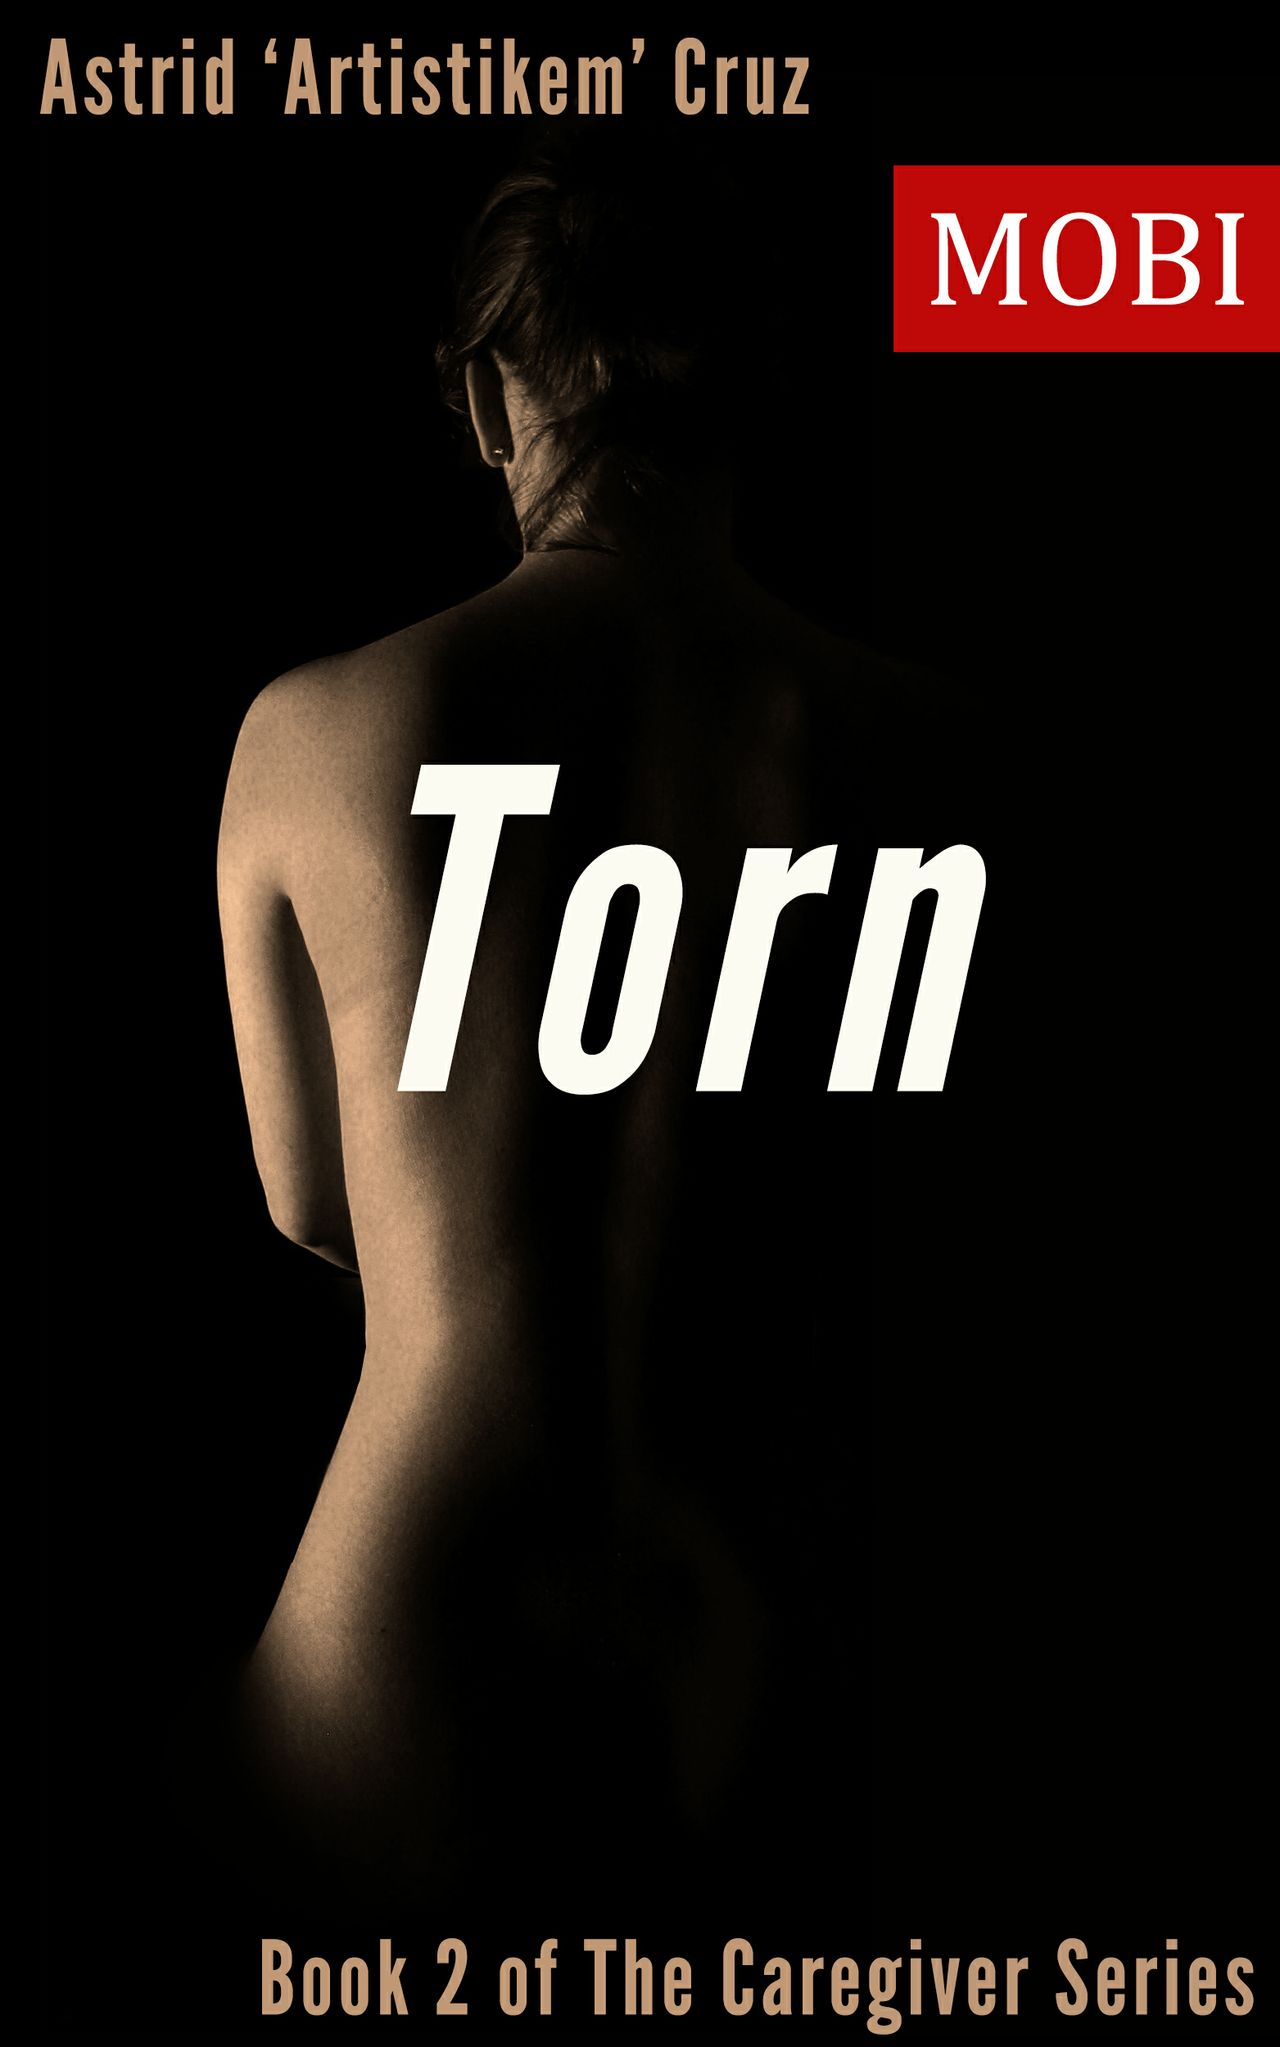 Torn (Book 2 of The Caregiver Series) - mobi